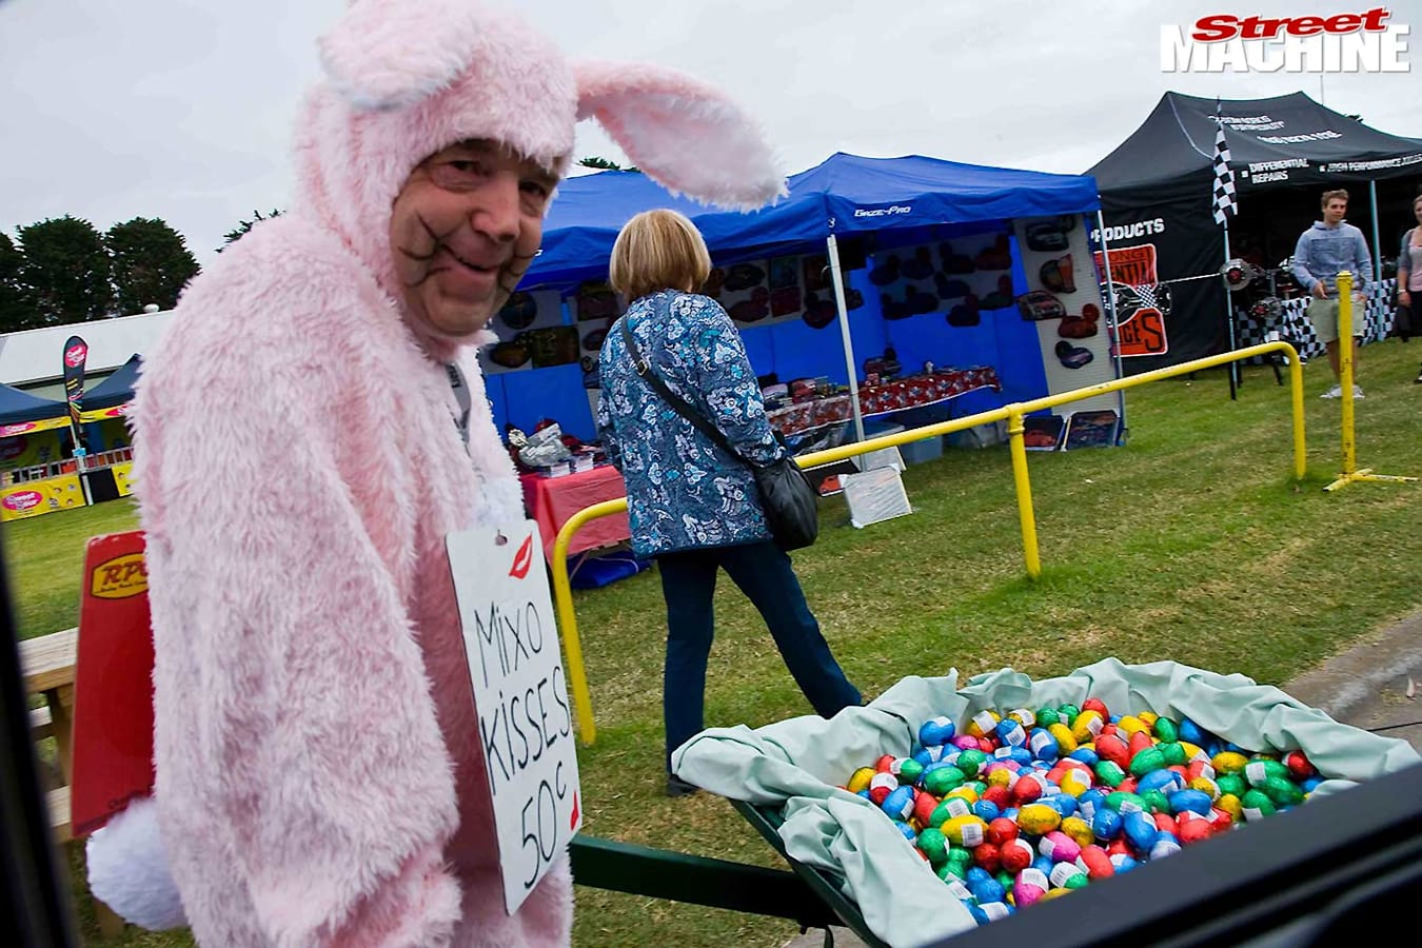 Rod Hadfield as Easter Bunny